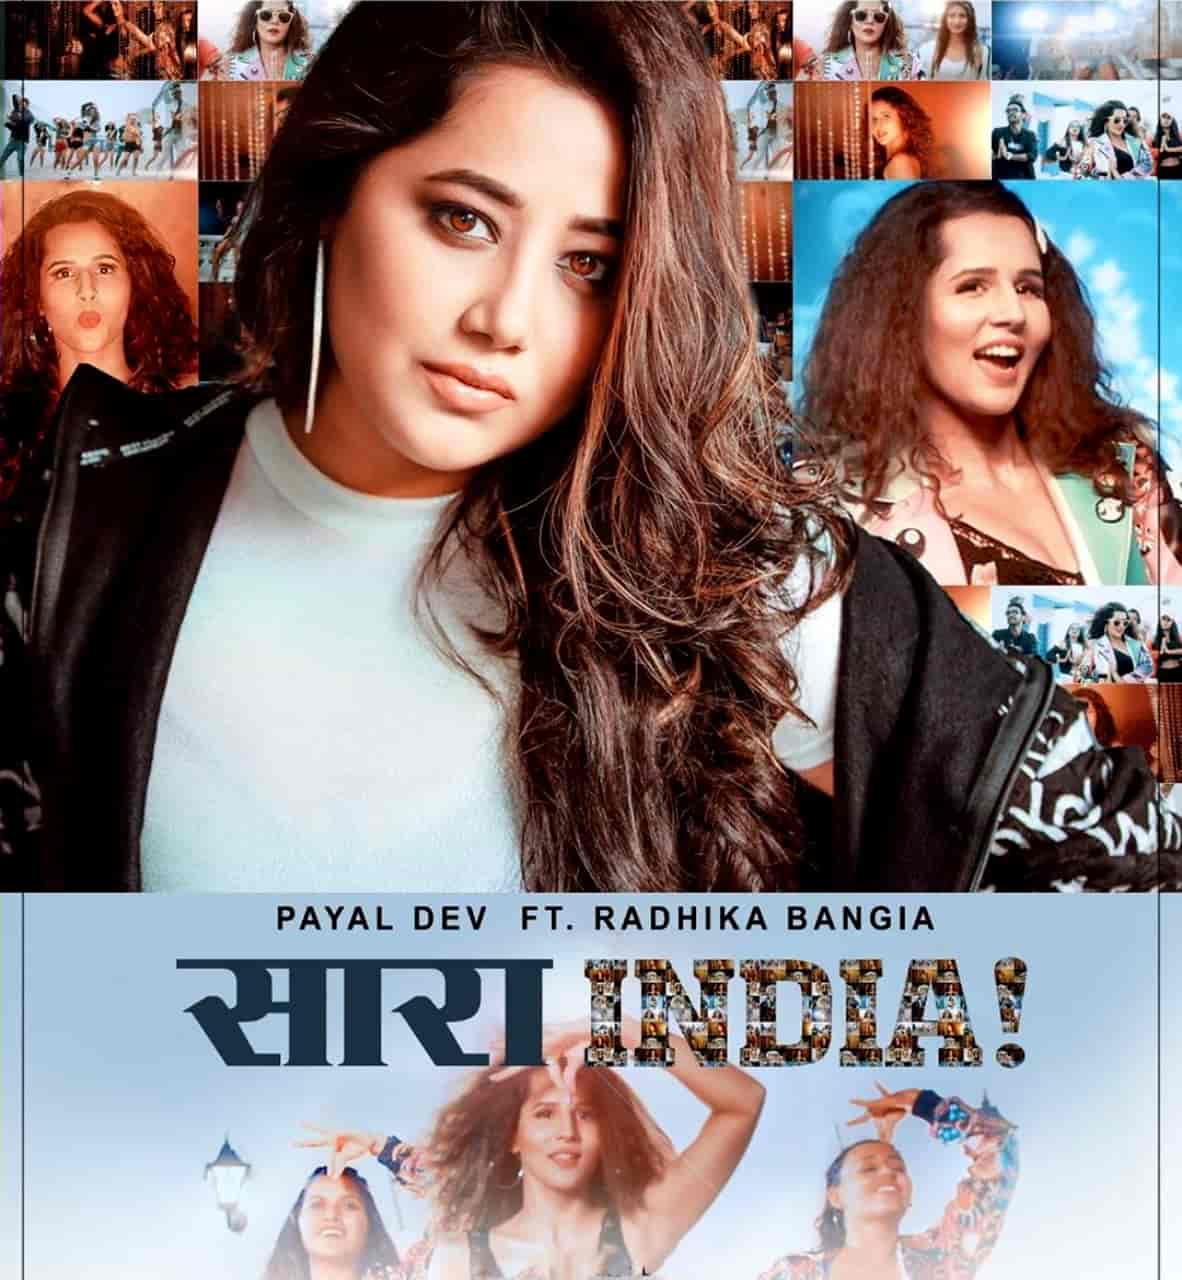 Saara India Song Image Features Radhika Bangia